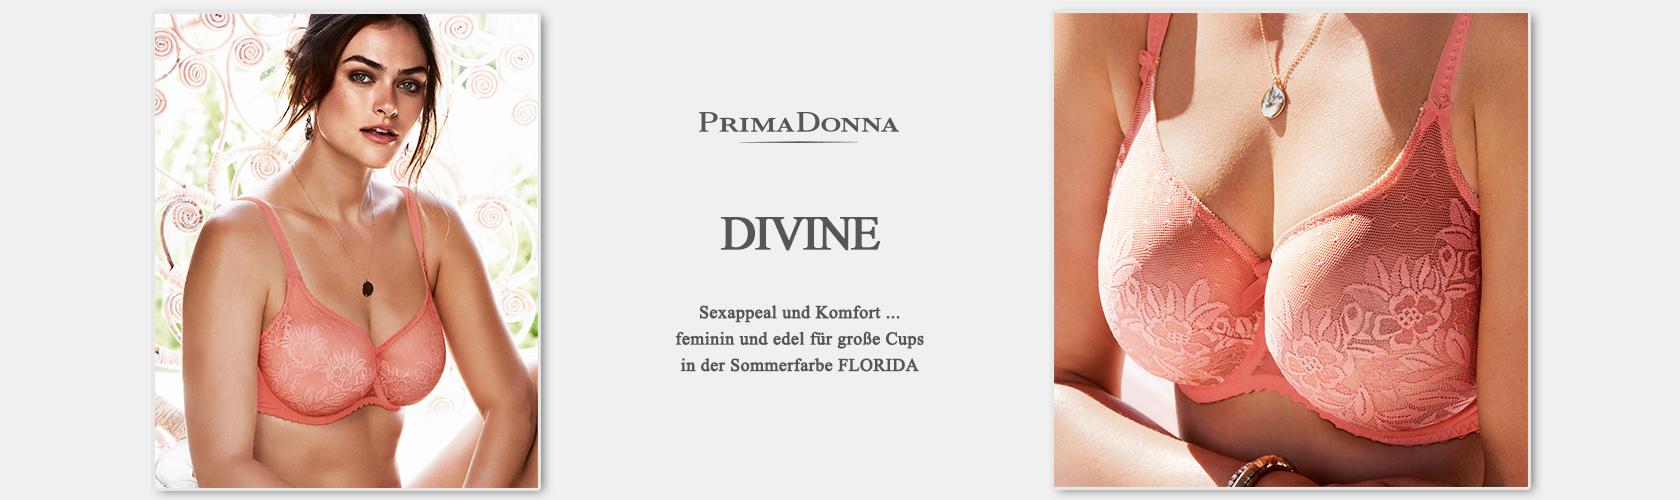 Slideshow DIVINE 08.06.